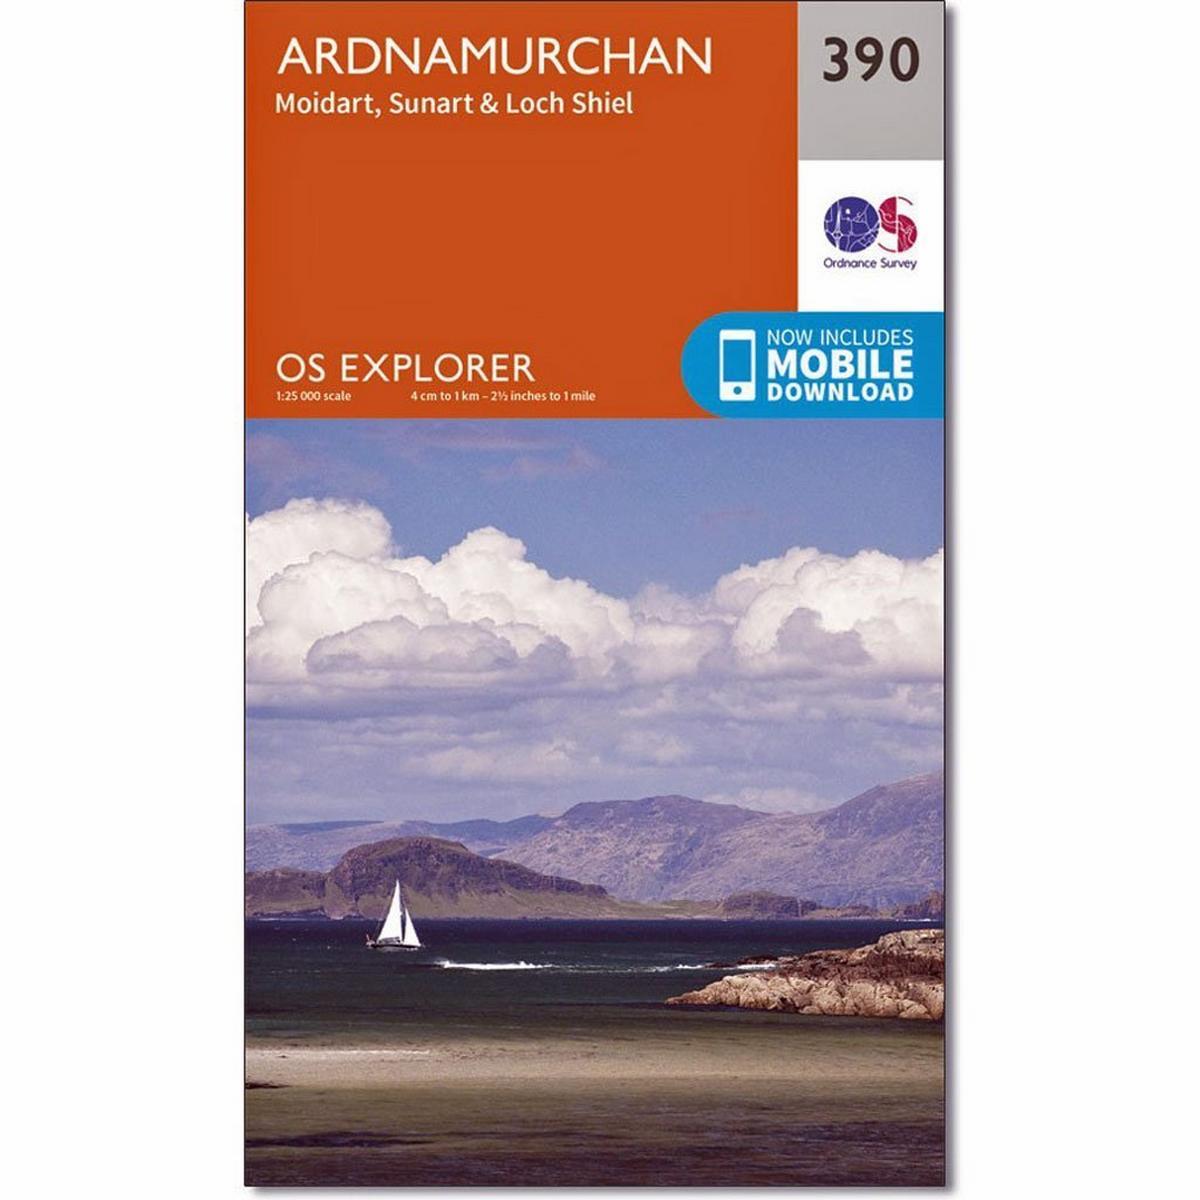 Ordnance Survey OS Explorer ACTIVE Map 390 Ardnamurchan, Moidart, Sunart & Loch Shiel